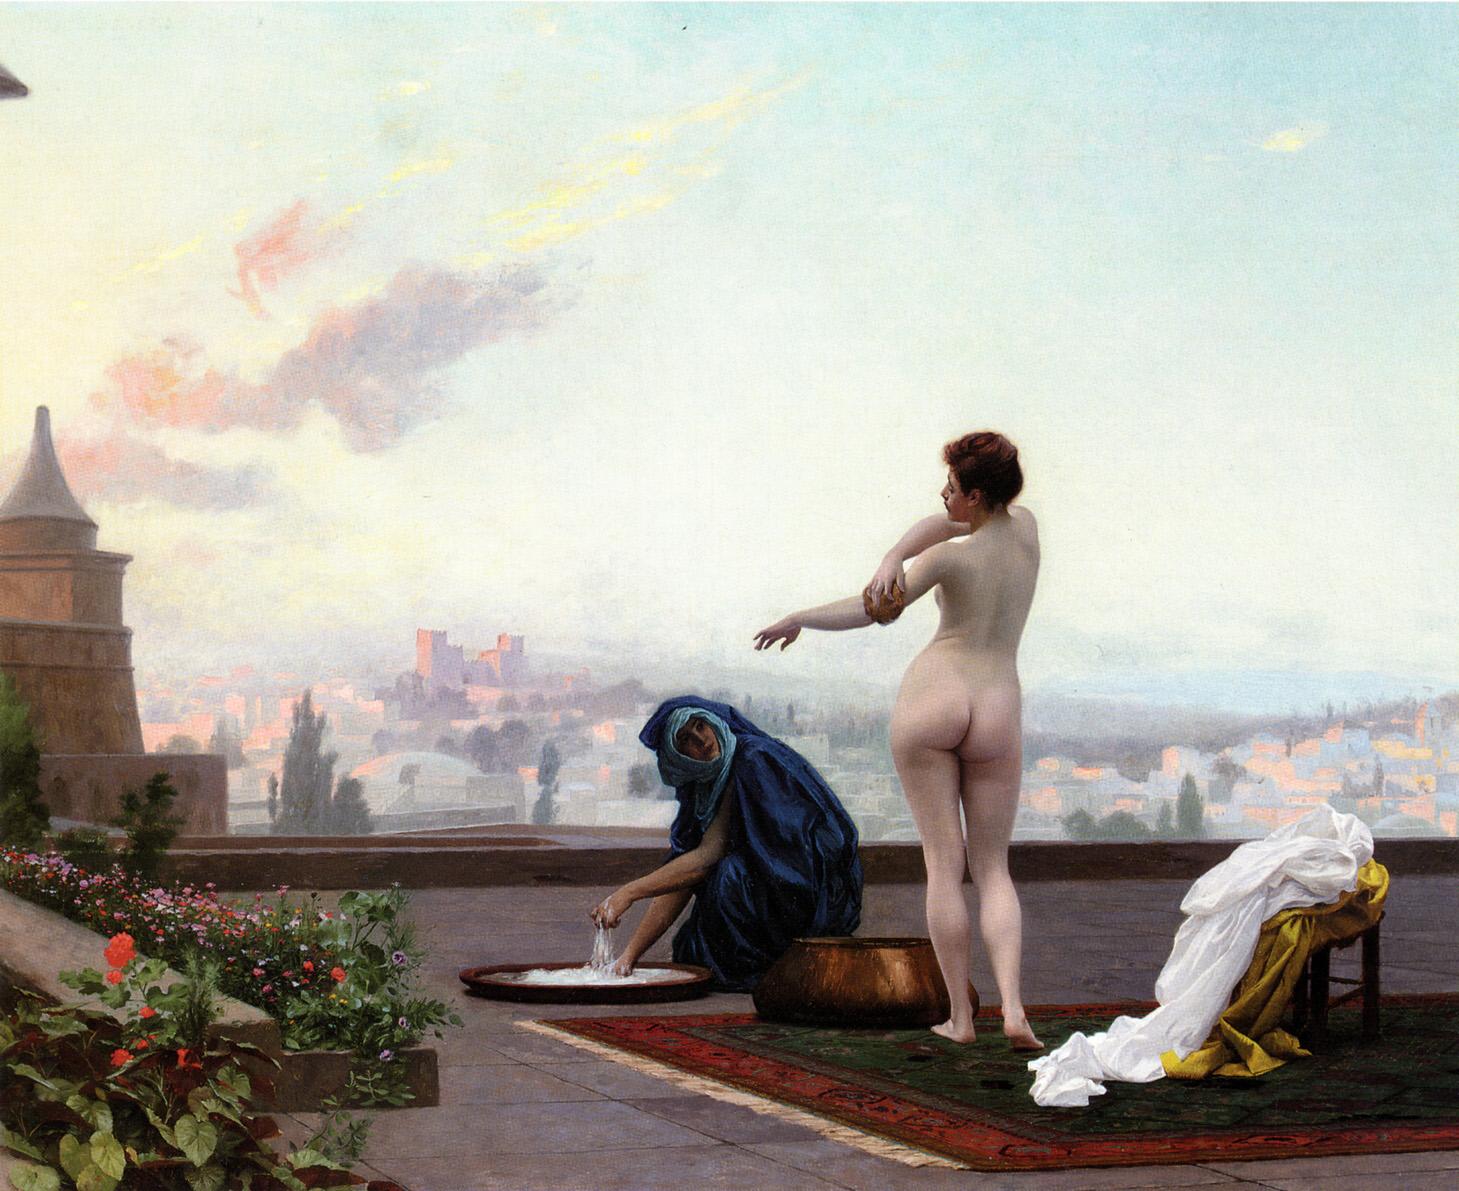 http://uploads1.wikipaintings.org/images/jean-leon-gerome/bathsheba-1899.jpg